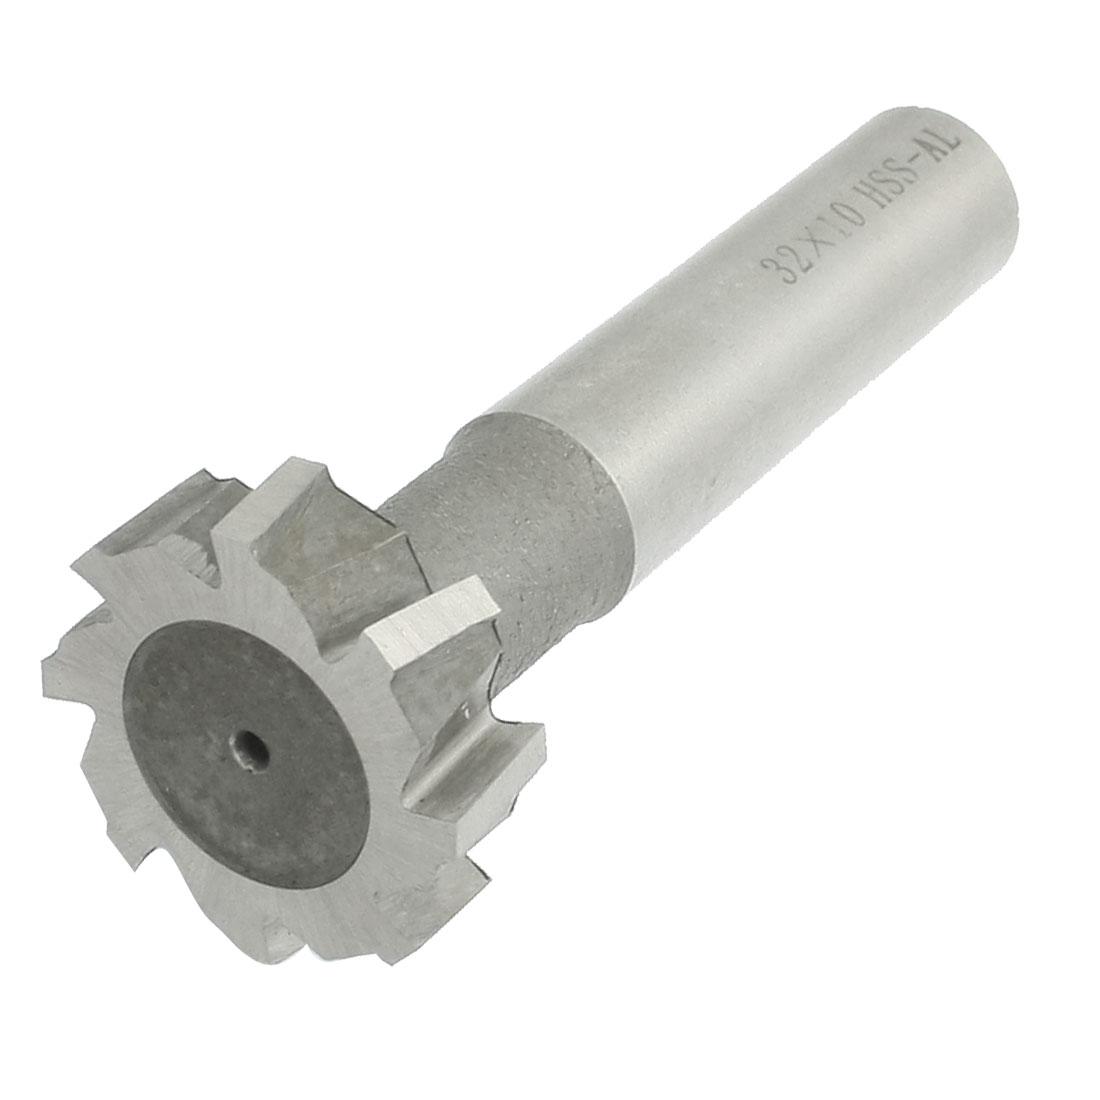 "Straight Shank 1 7/25"" x 13/32"" HSS 8 Flutes T Slot Milling Cutter"